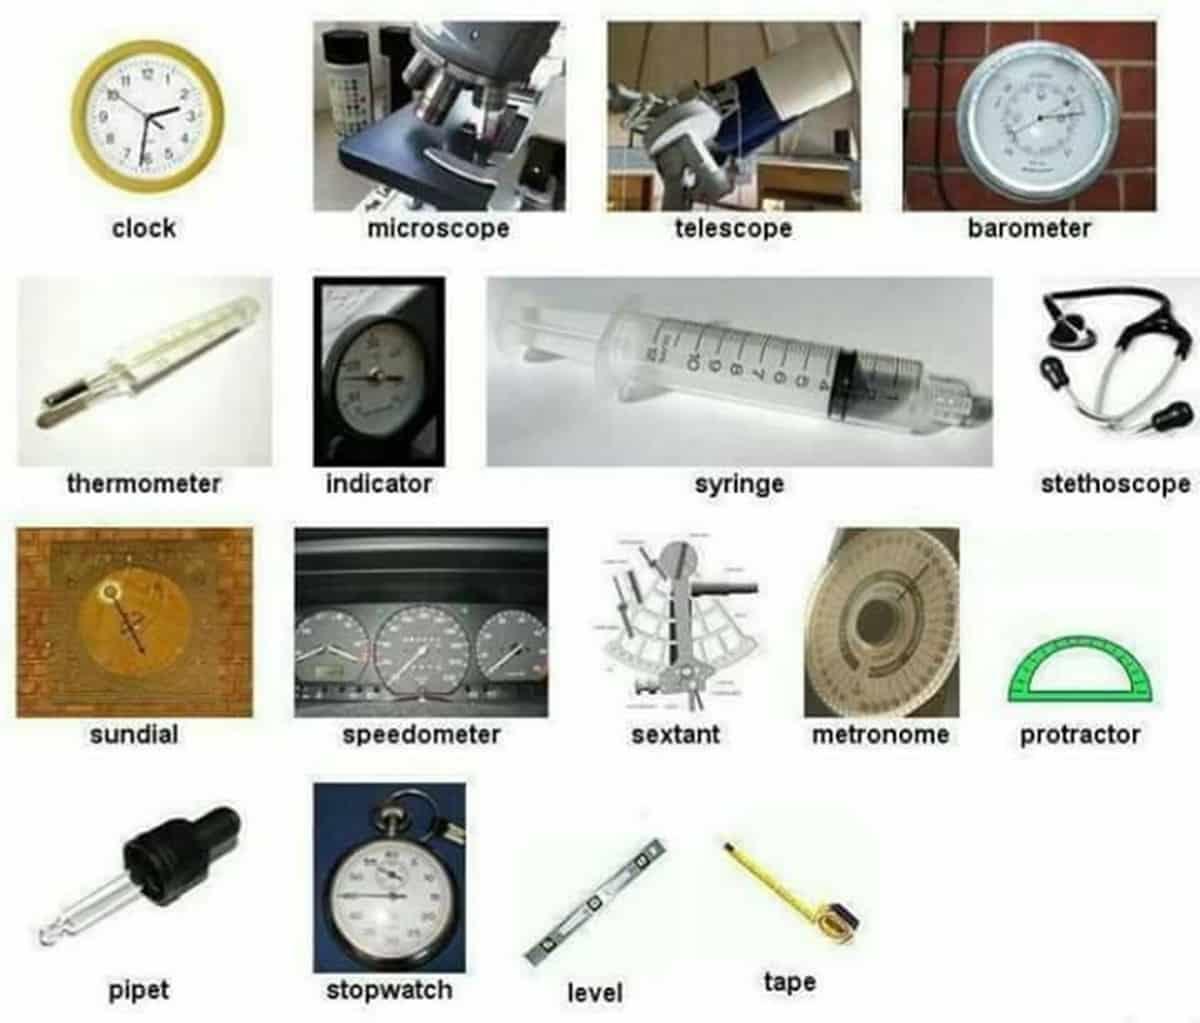 English Vocabulary: Laboratory Equipment and Scientific Instruments 15